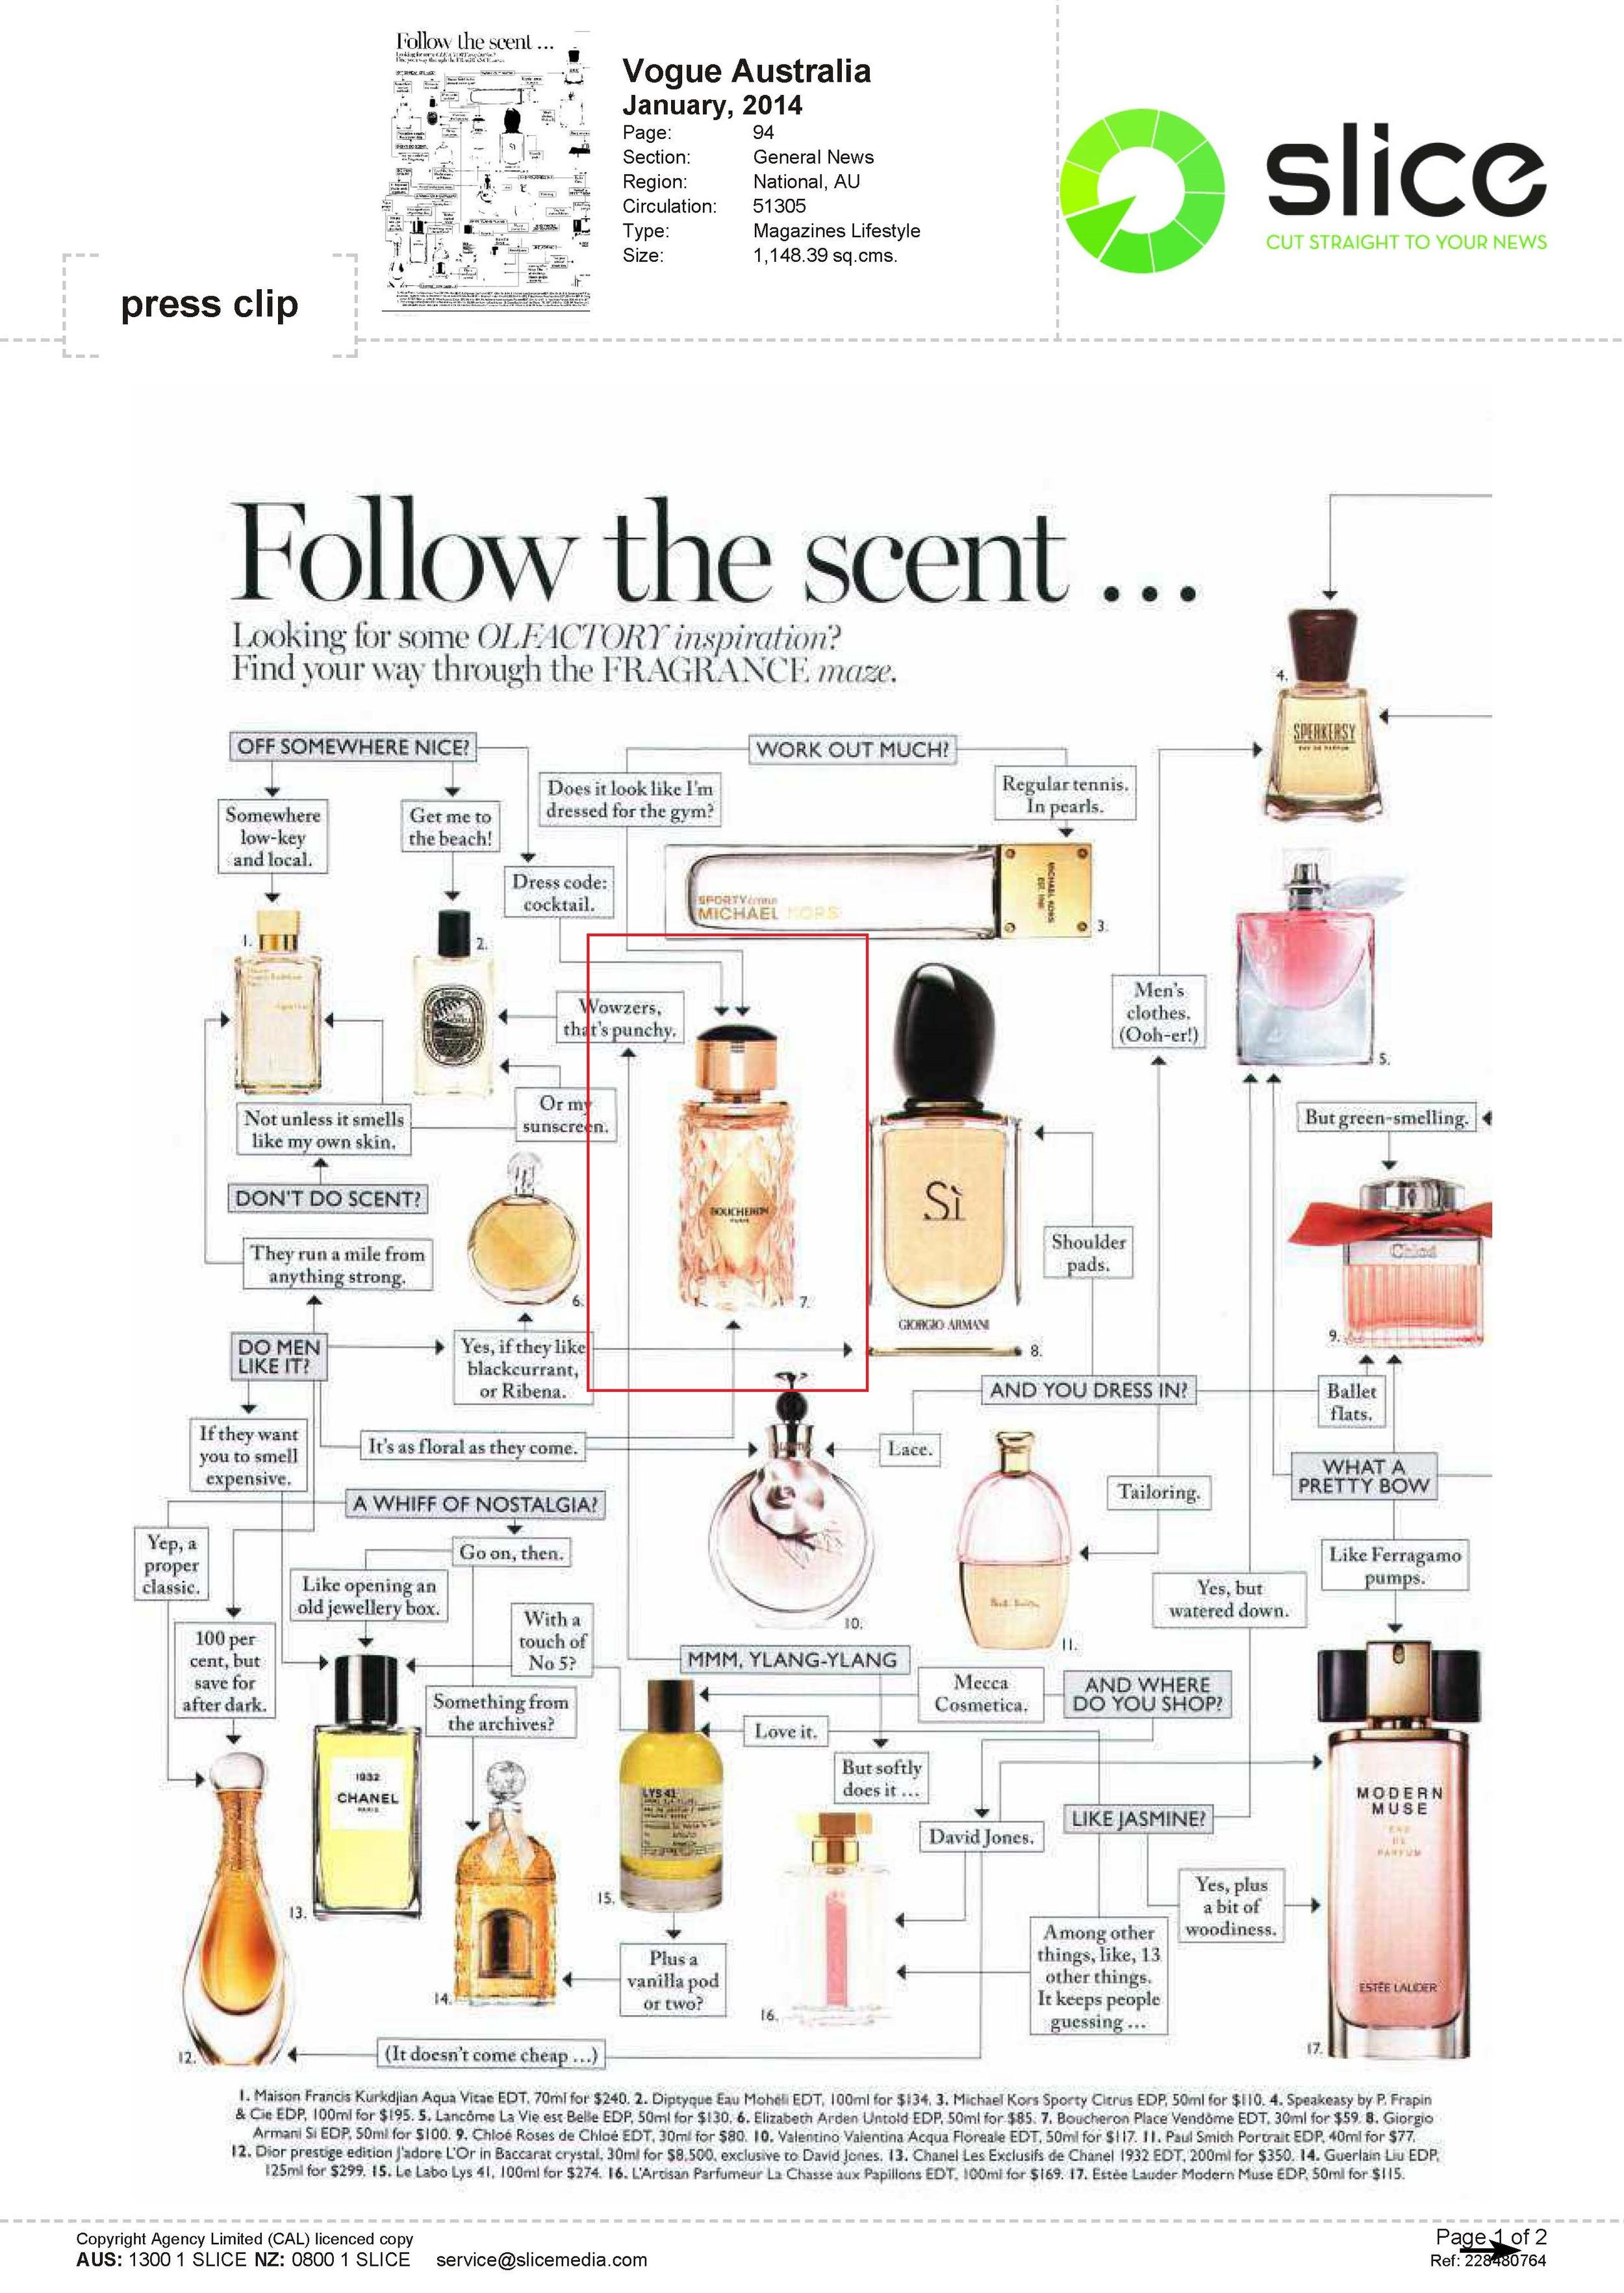 Boucheron perfume in Vogue (Australia) January 2014